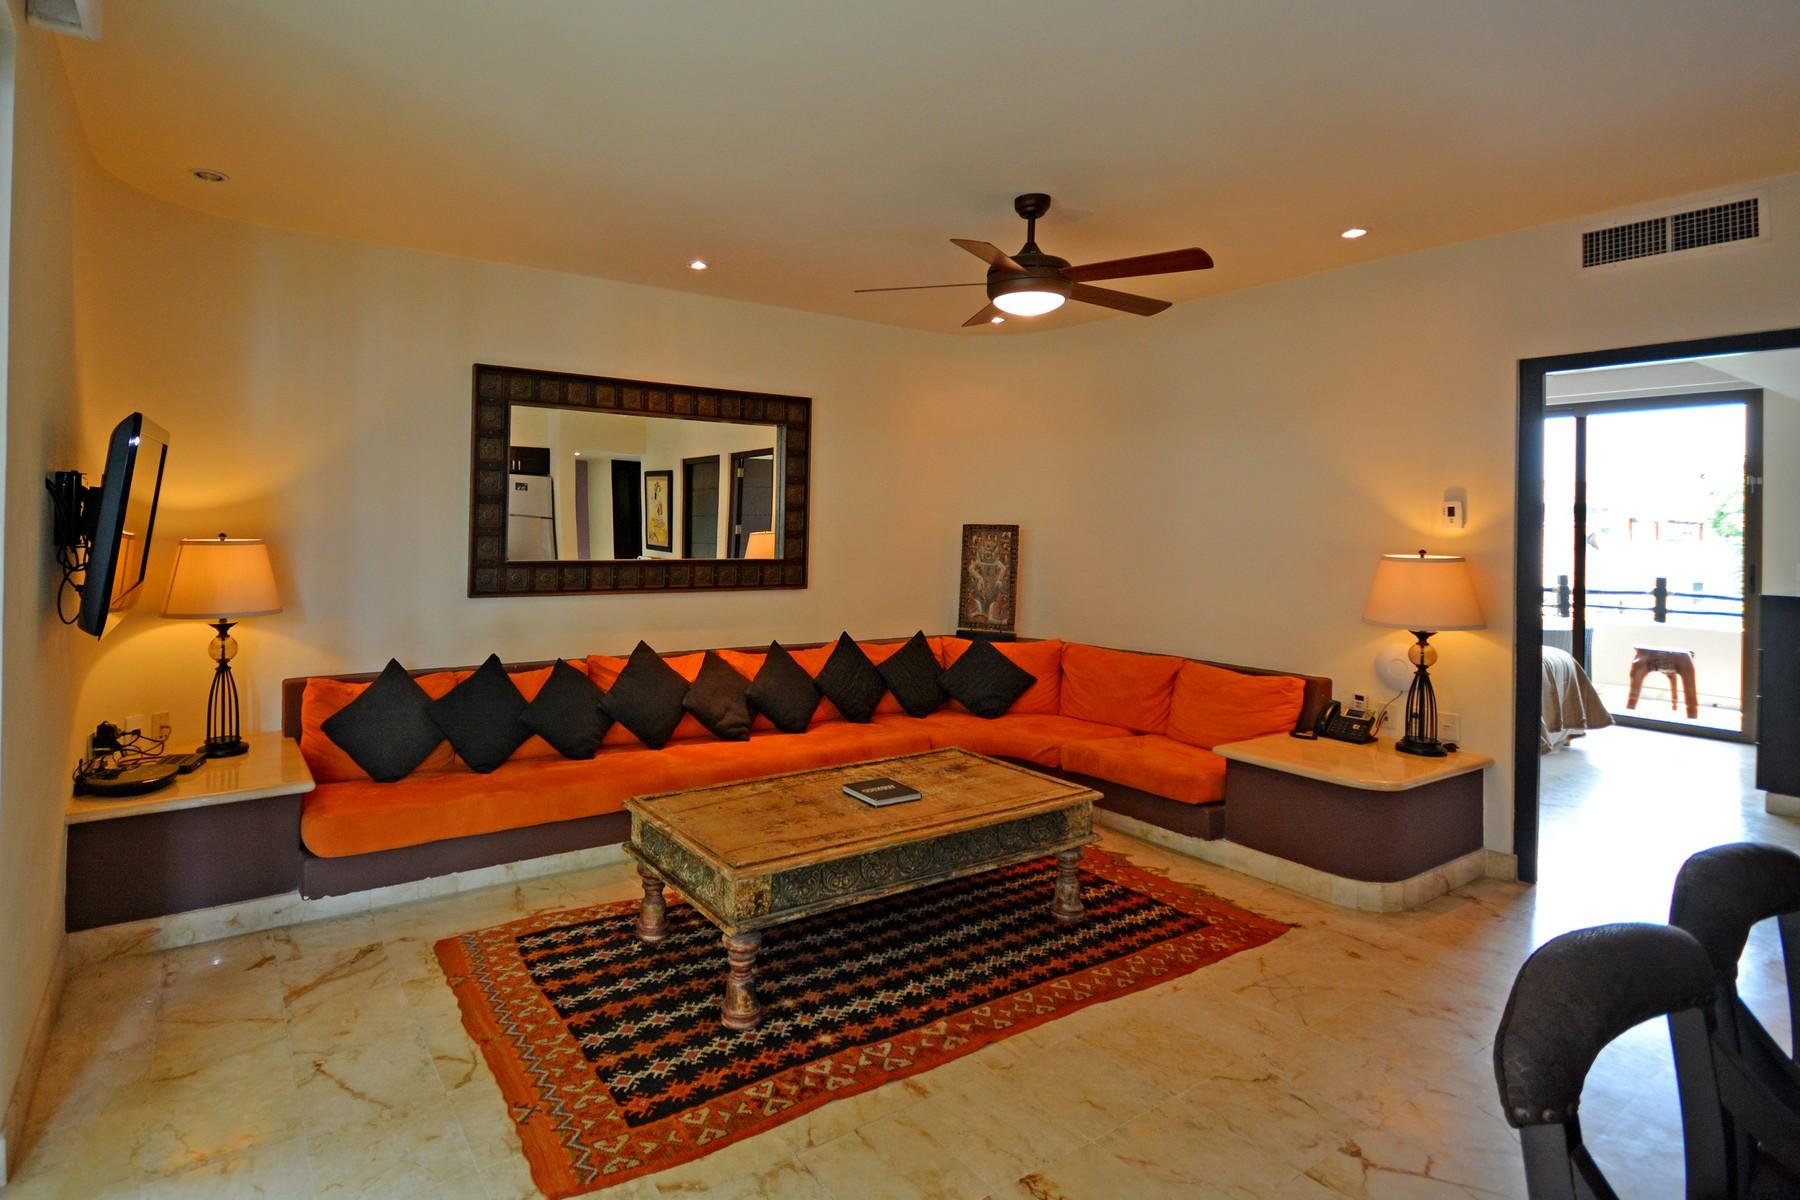 Additional photo for property listing at INSPIRADOR DEPARTAMENTO DE FRENTE DE PLAYA Oceanfront,  3rd Level, El Taj Calle 1era Nte, entre 12 y 14 Nte. Playa Del Carmen, Quintana Roo 77710 México